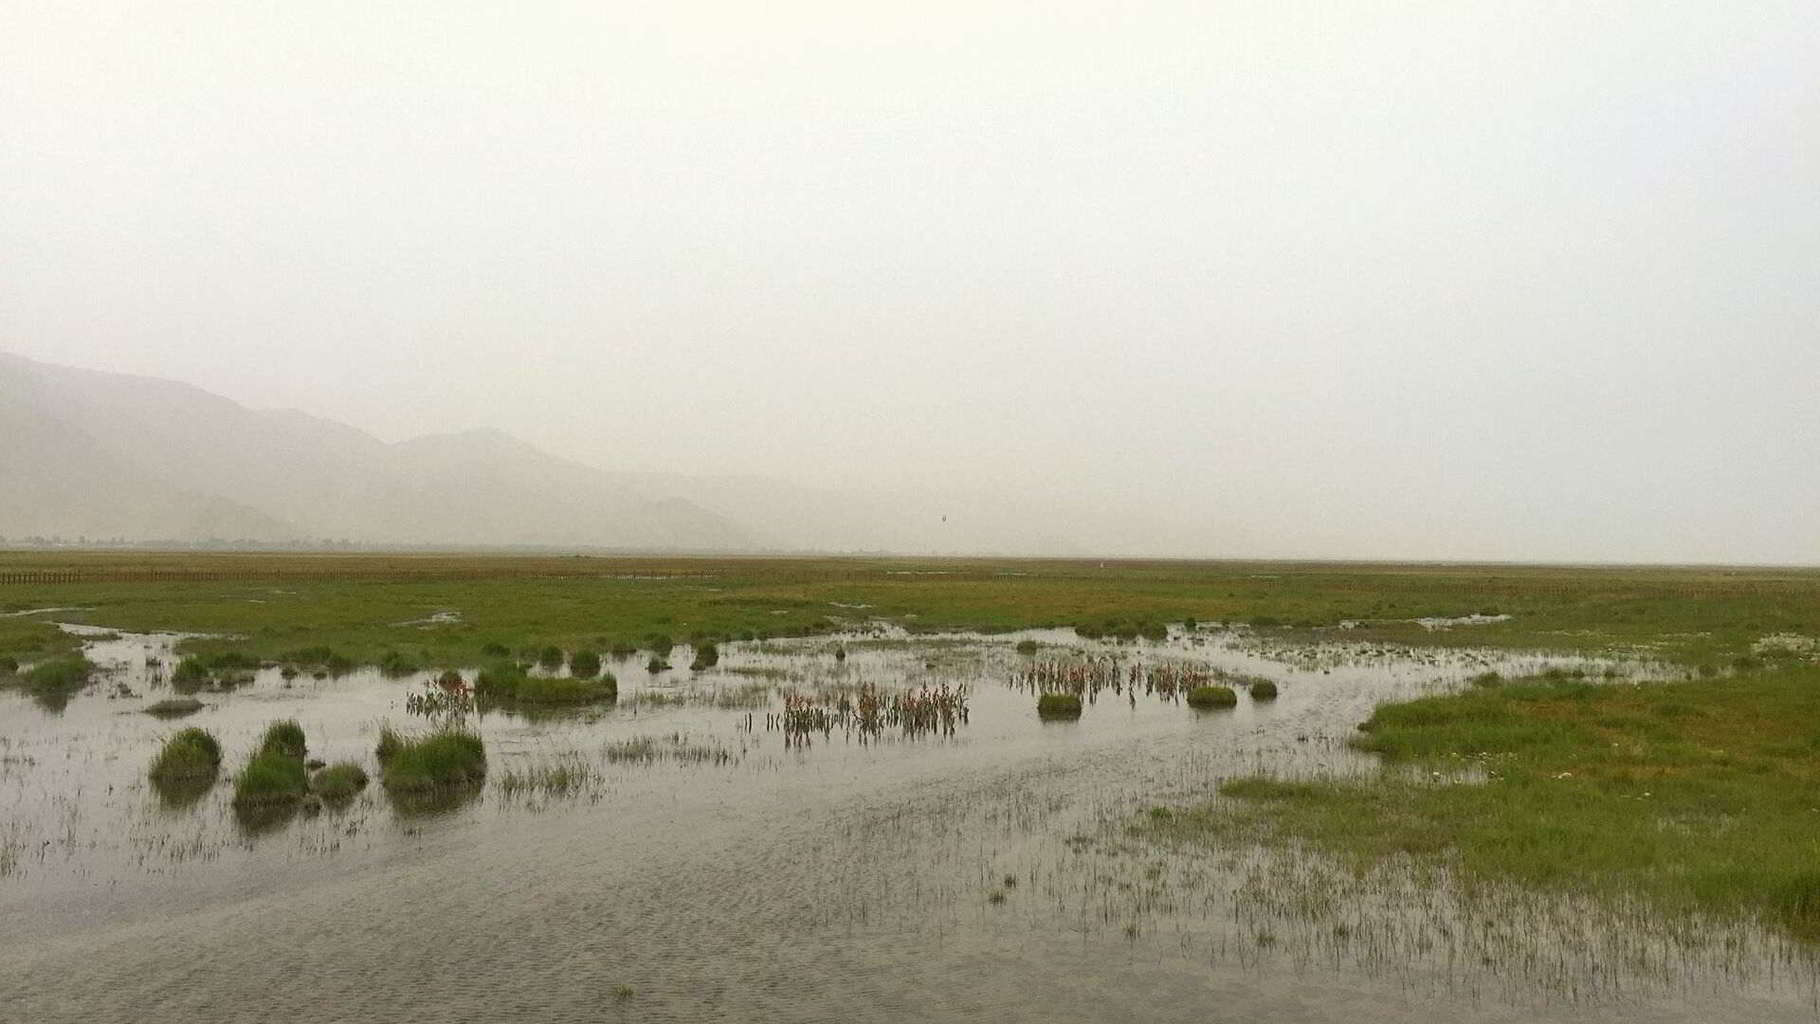 Golden Grassland in Tashkurgan